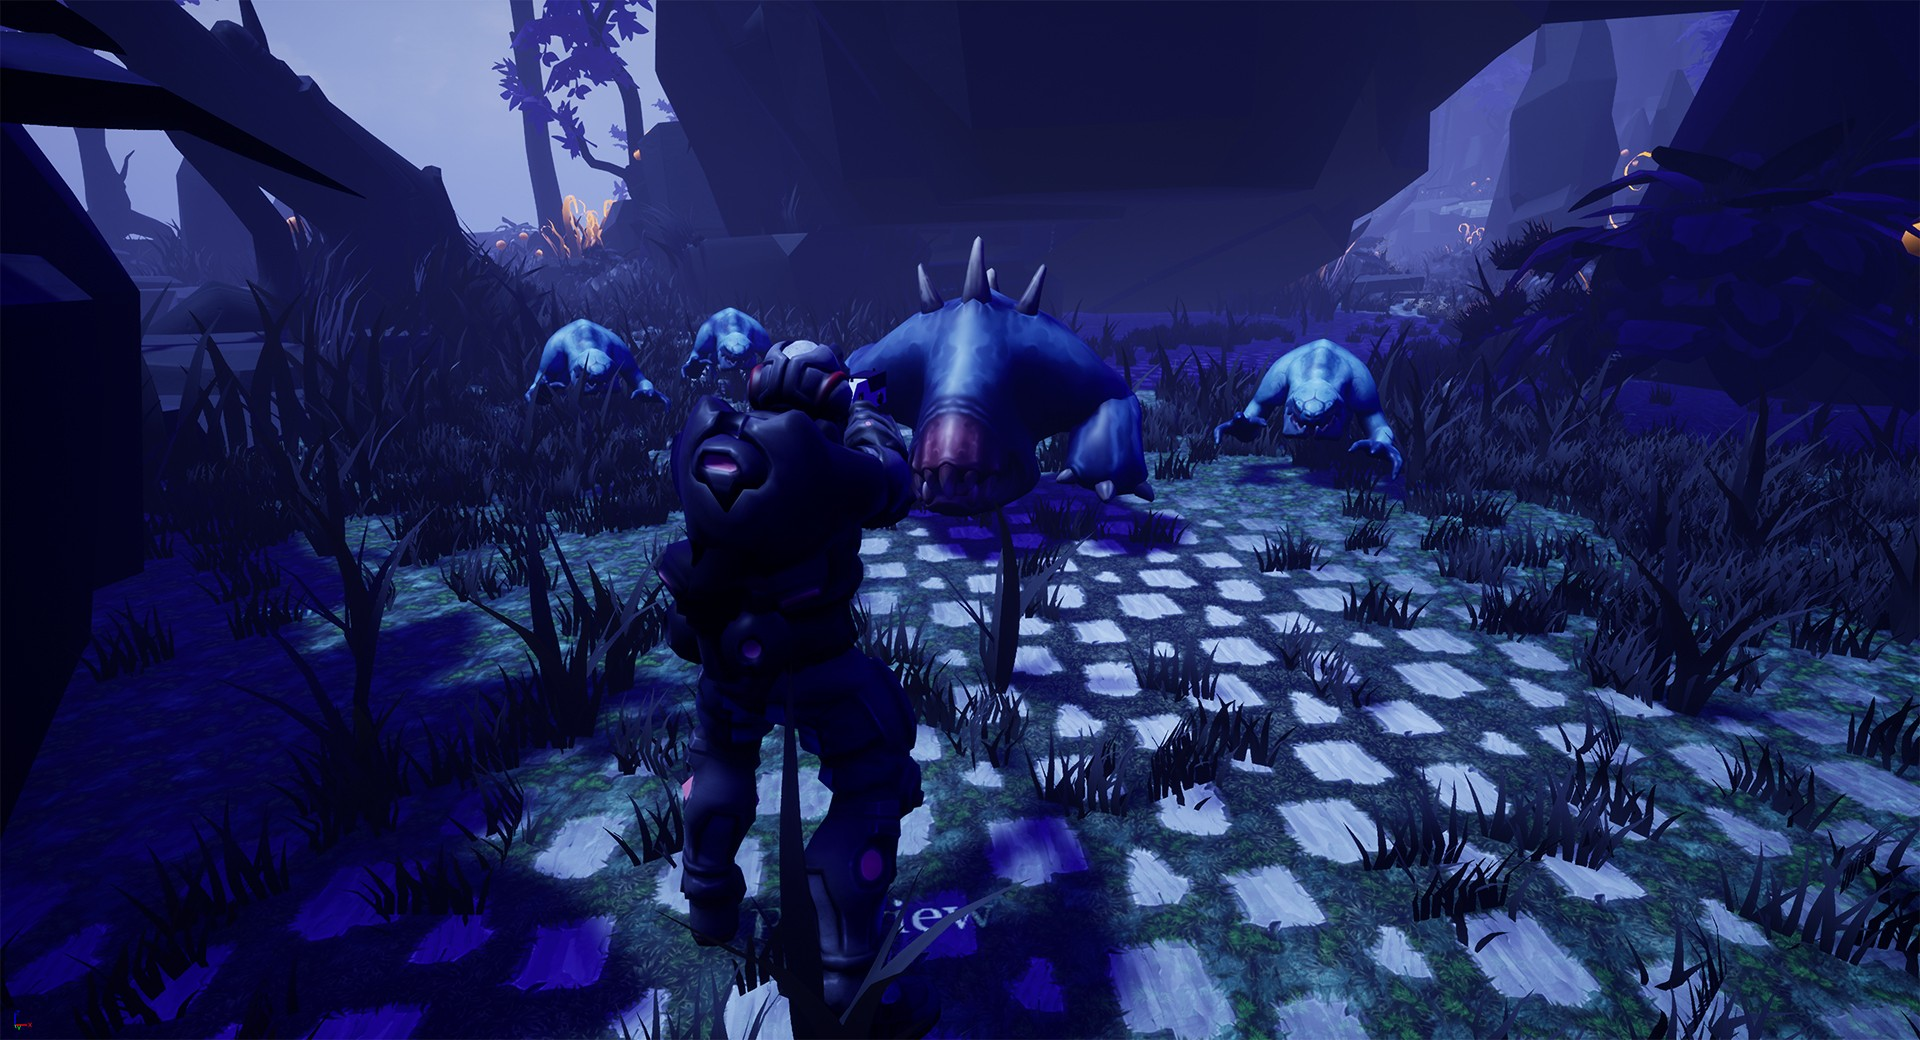 image gameplay2.jpeg